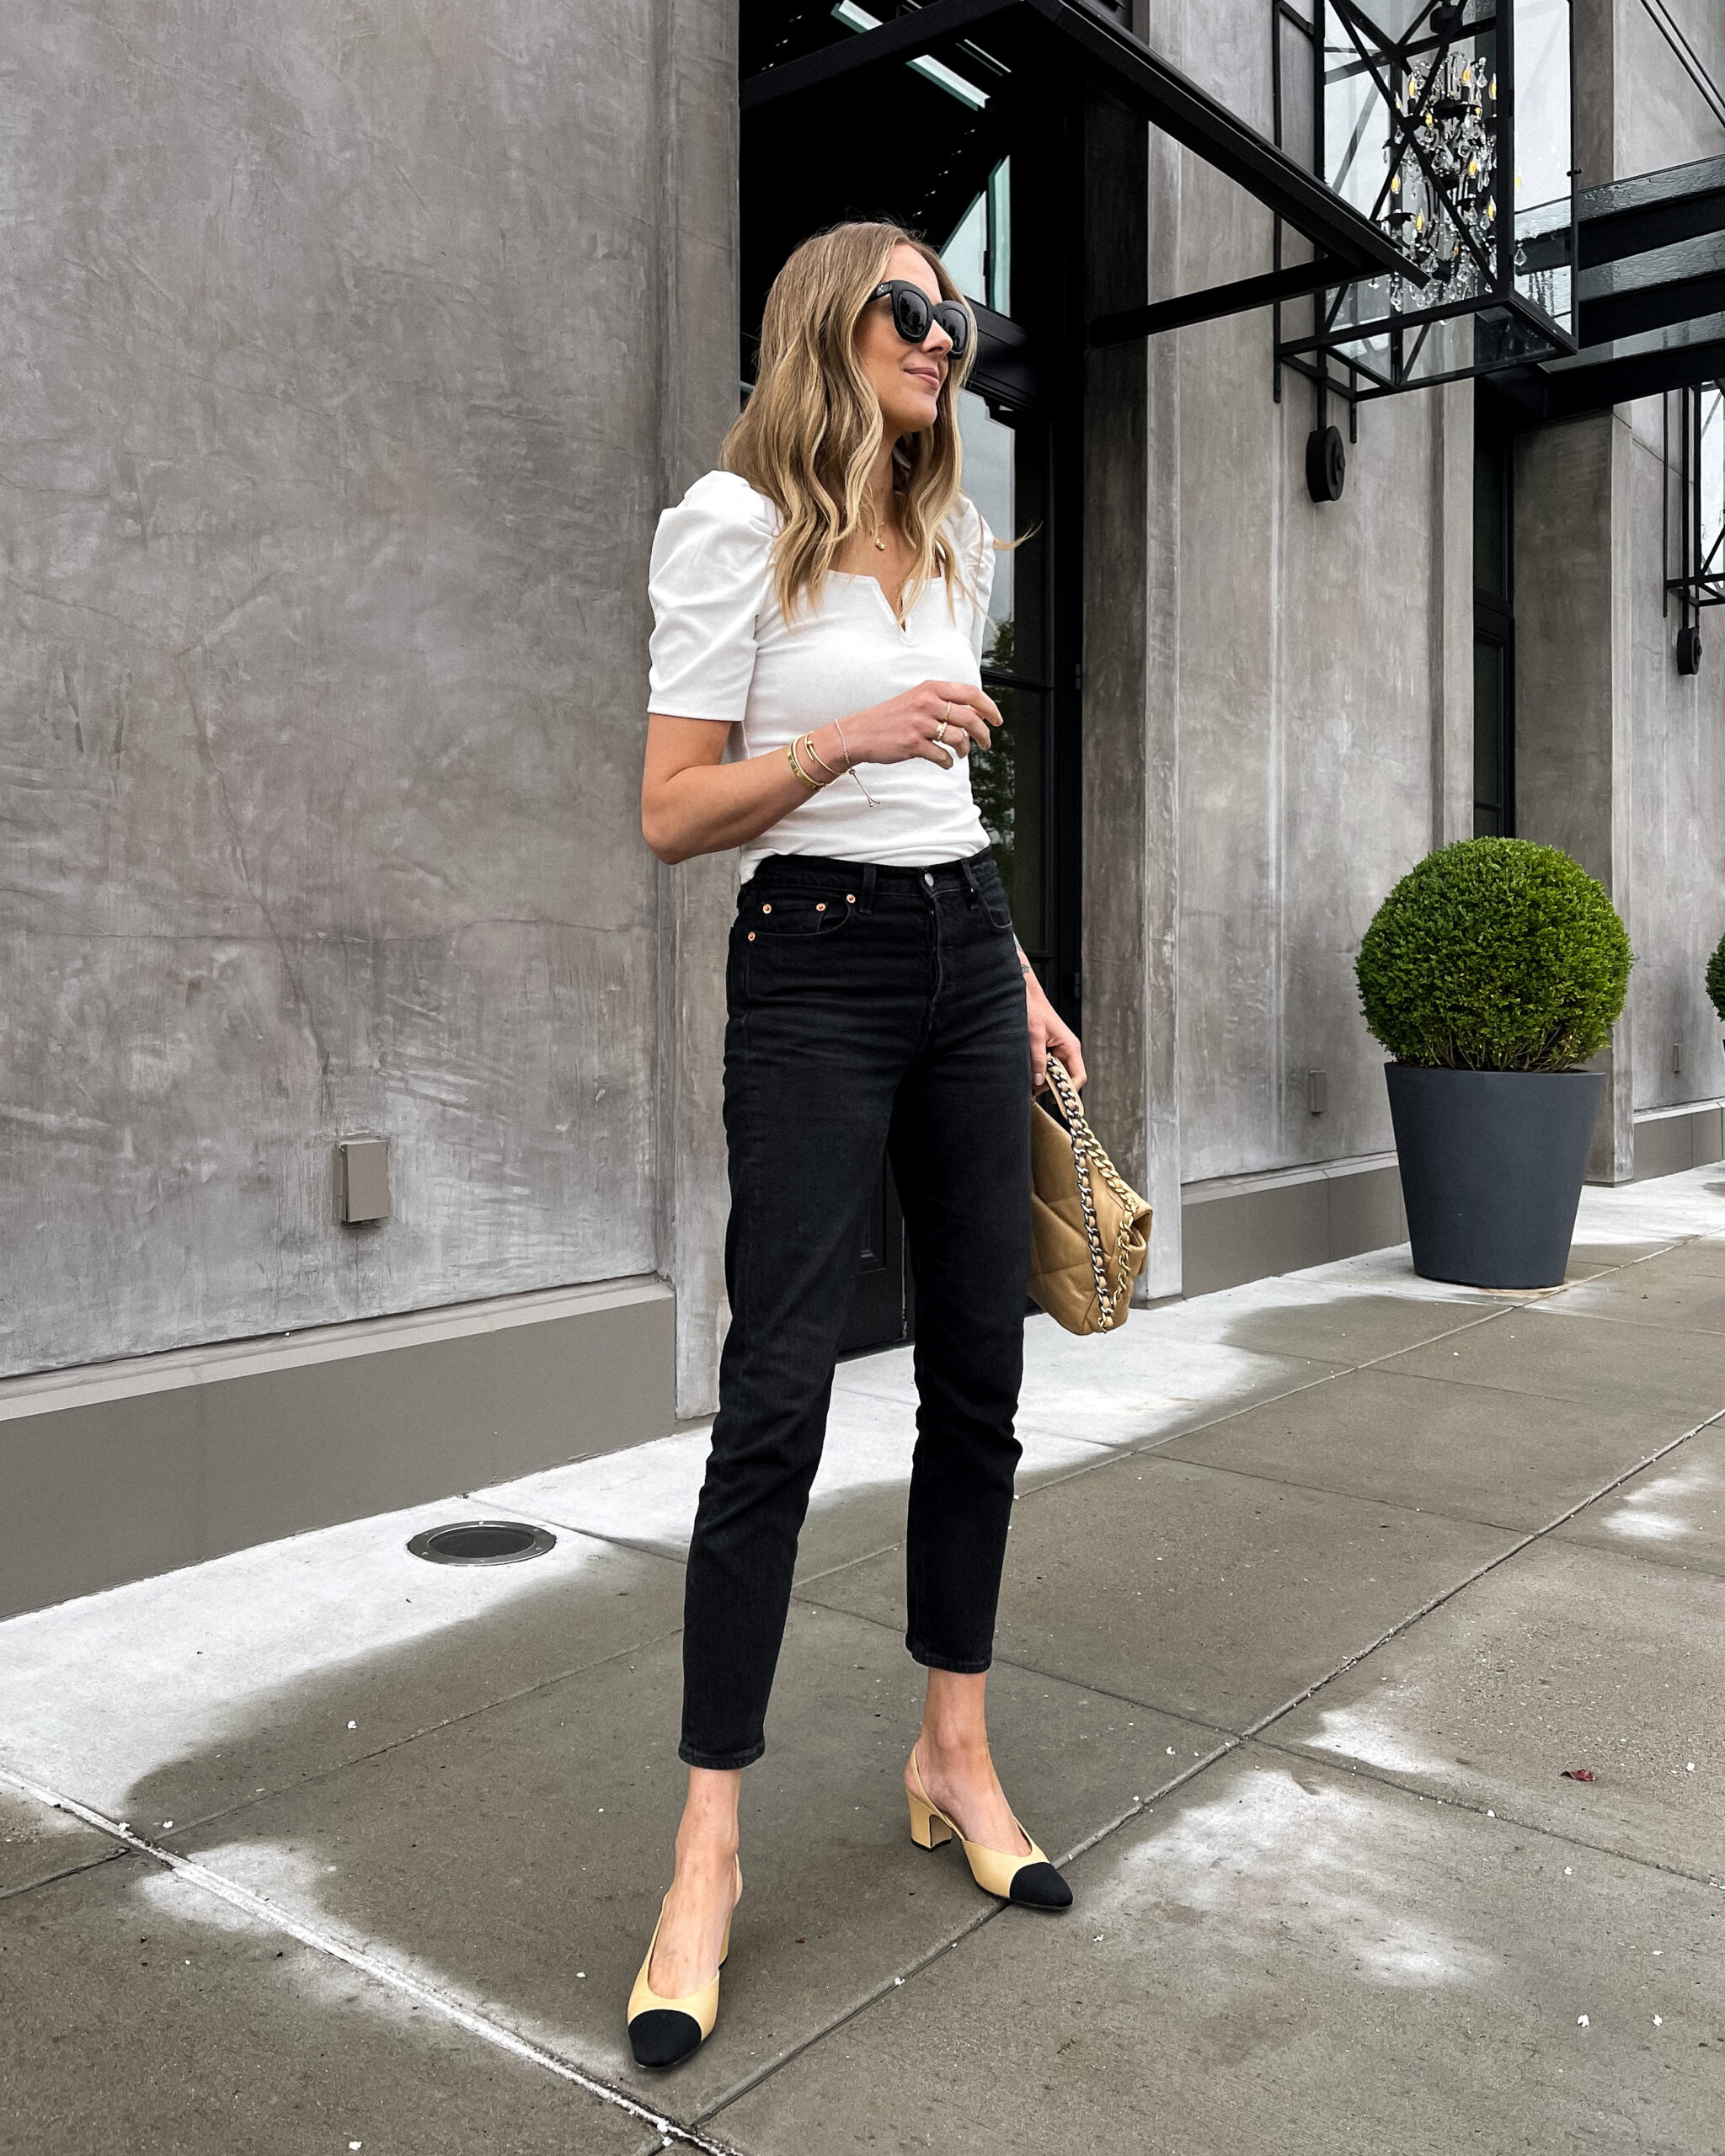 Fashion Jackson Wearing Amazon Fashion White Puff Sleeve Top Levis Black Jeans Chanel Slingbacks